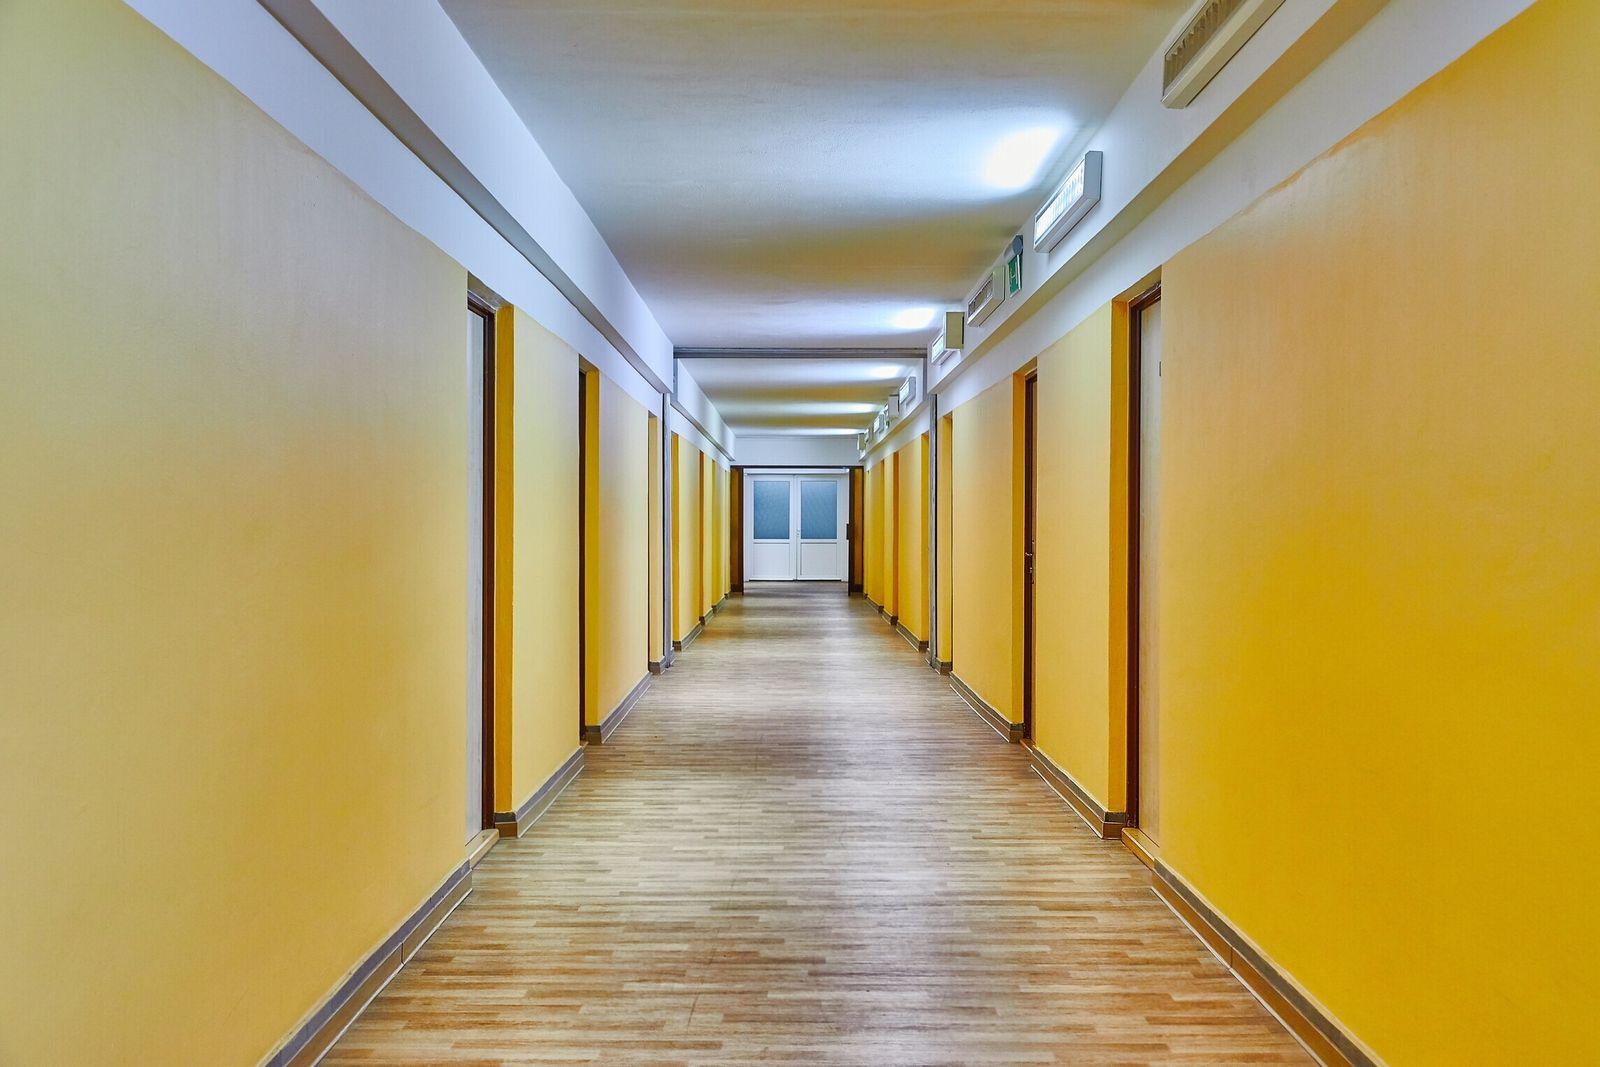 Plain corridor of a dormitory building (Gudella)